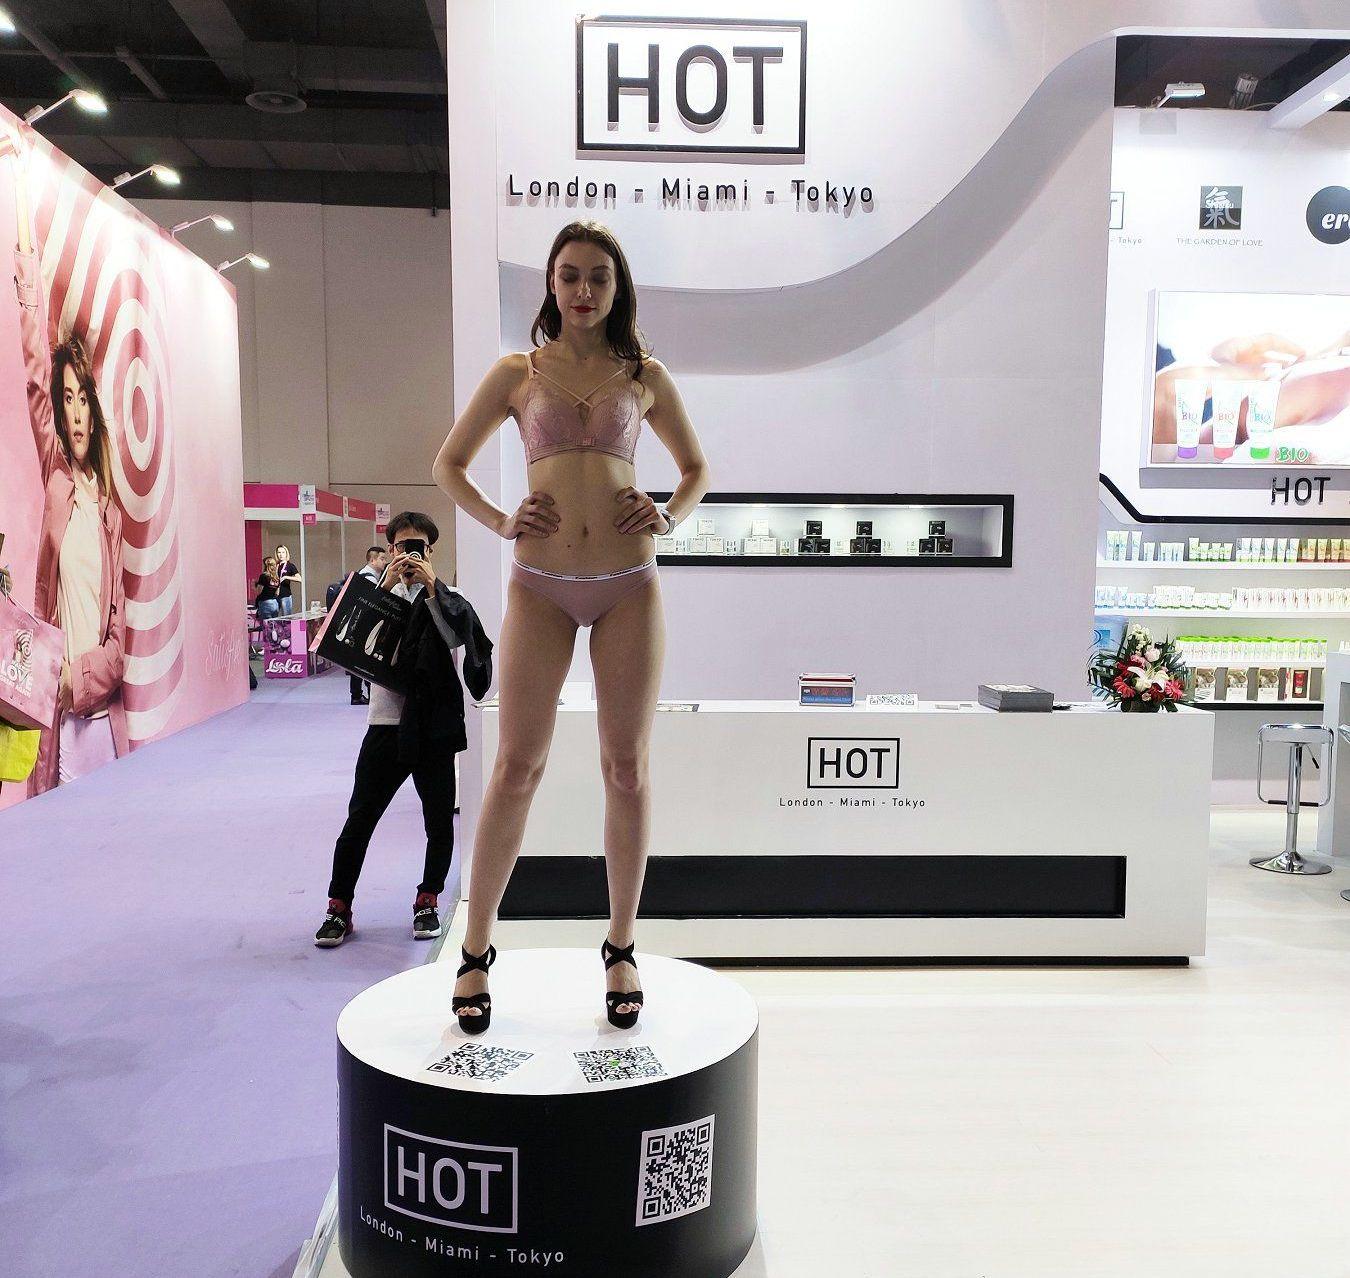 HOT邀请了外国模特展台